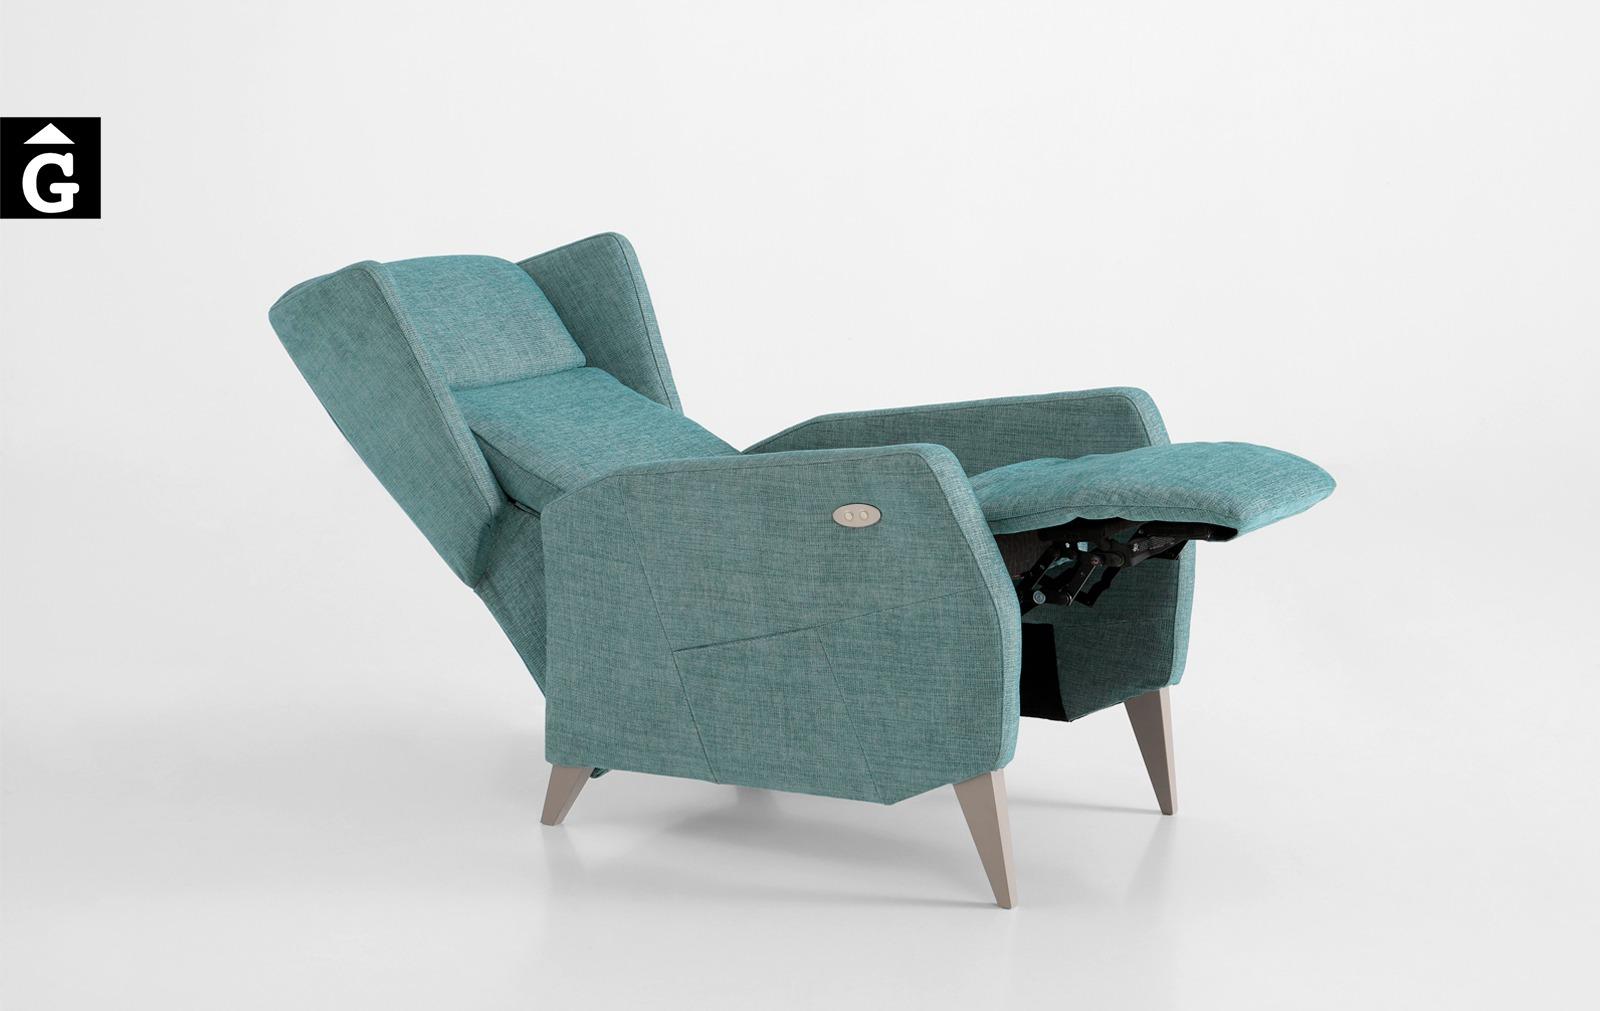 3 Tajoma by mobles Gifreu tapisseria de disseny actual i classic relax butaques sillons